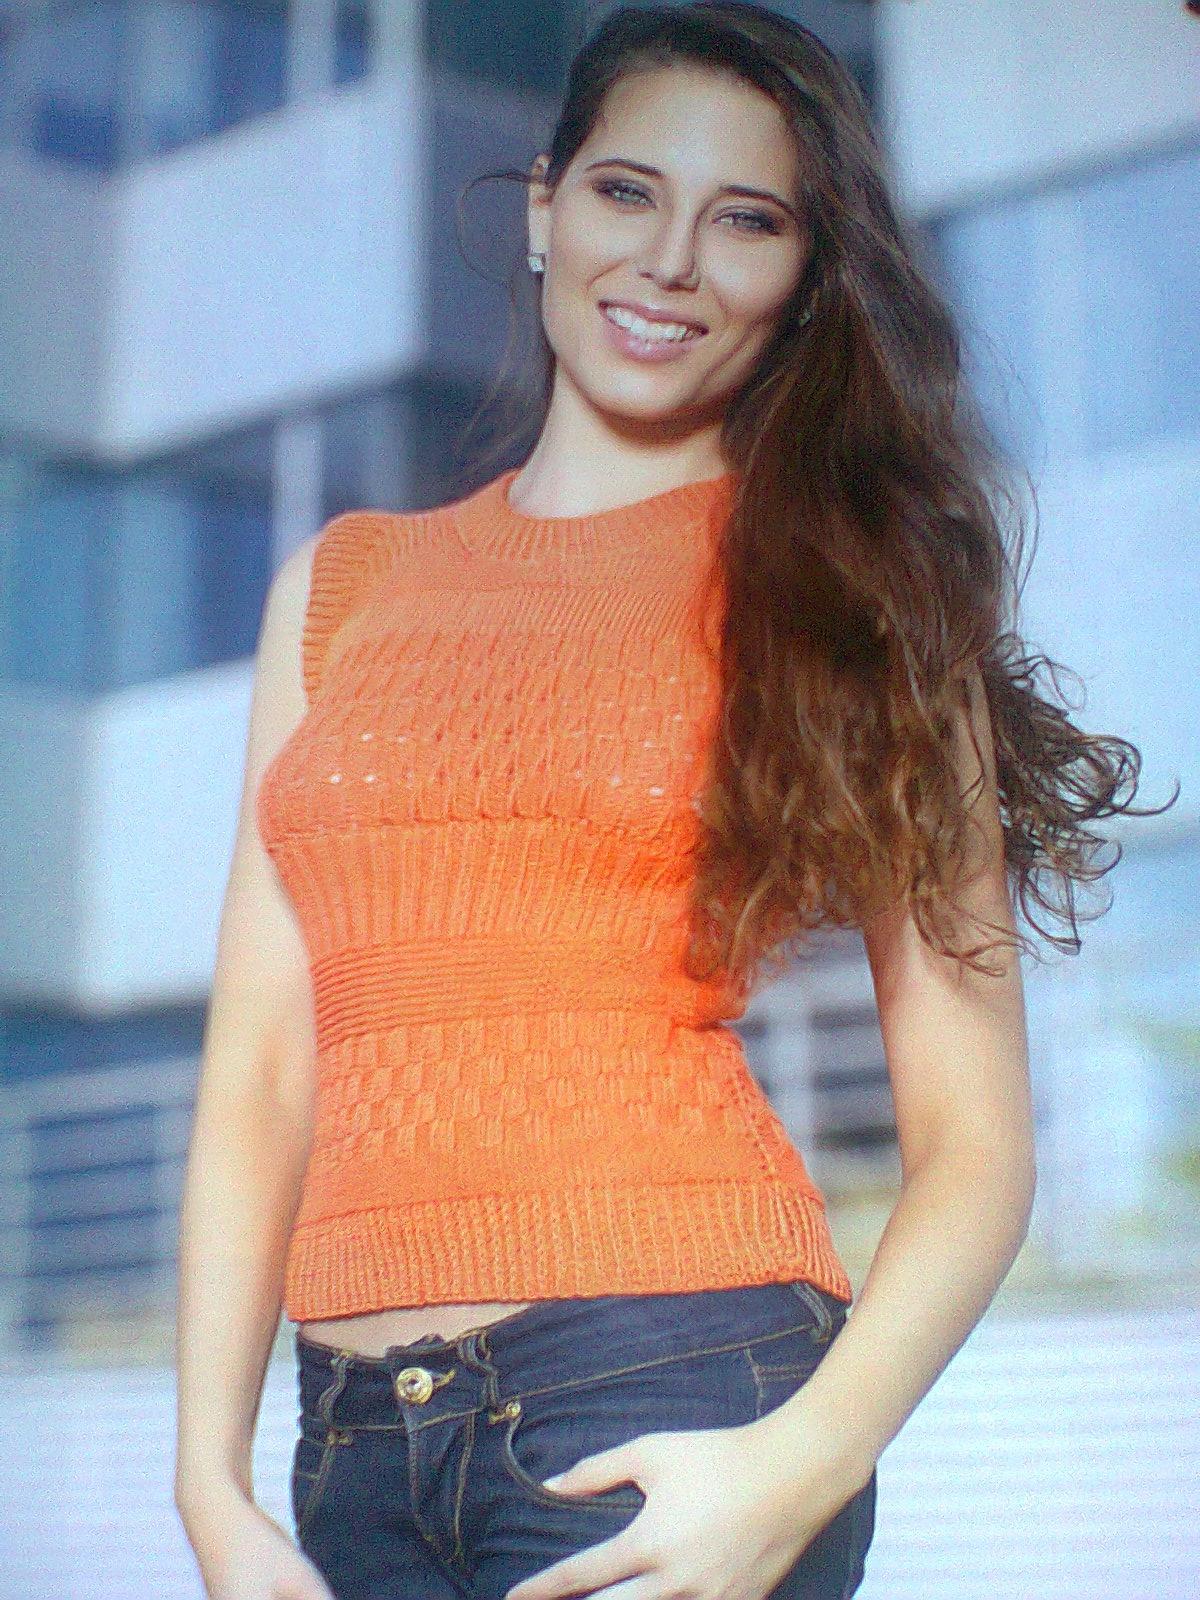 Idees De Fait Main Debardeur Femme Crochet Modele Gratuit